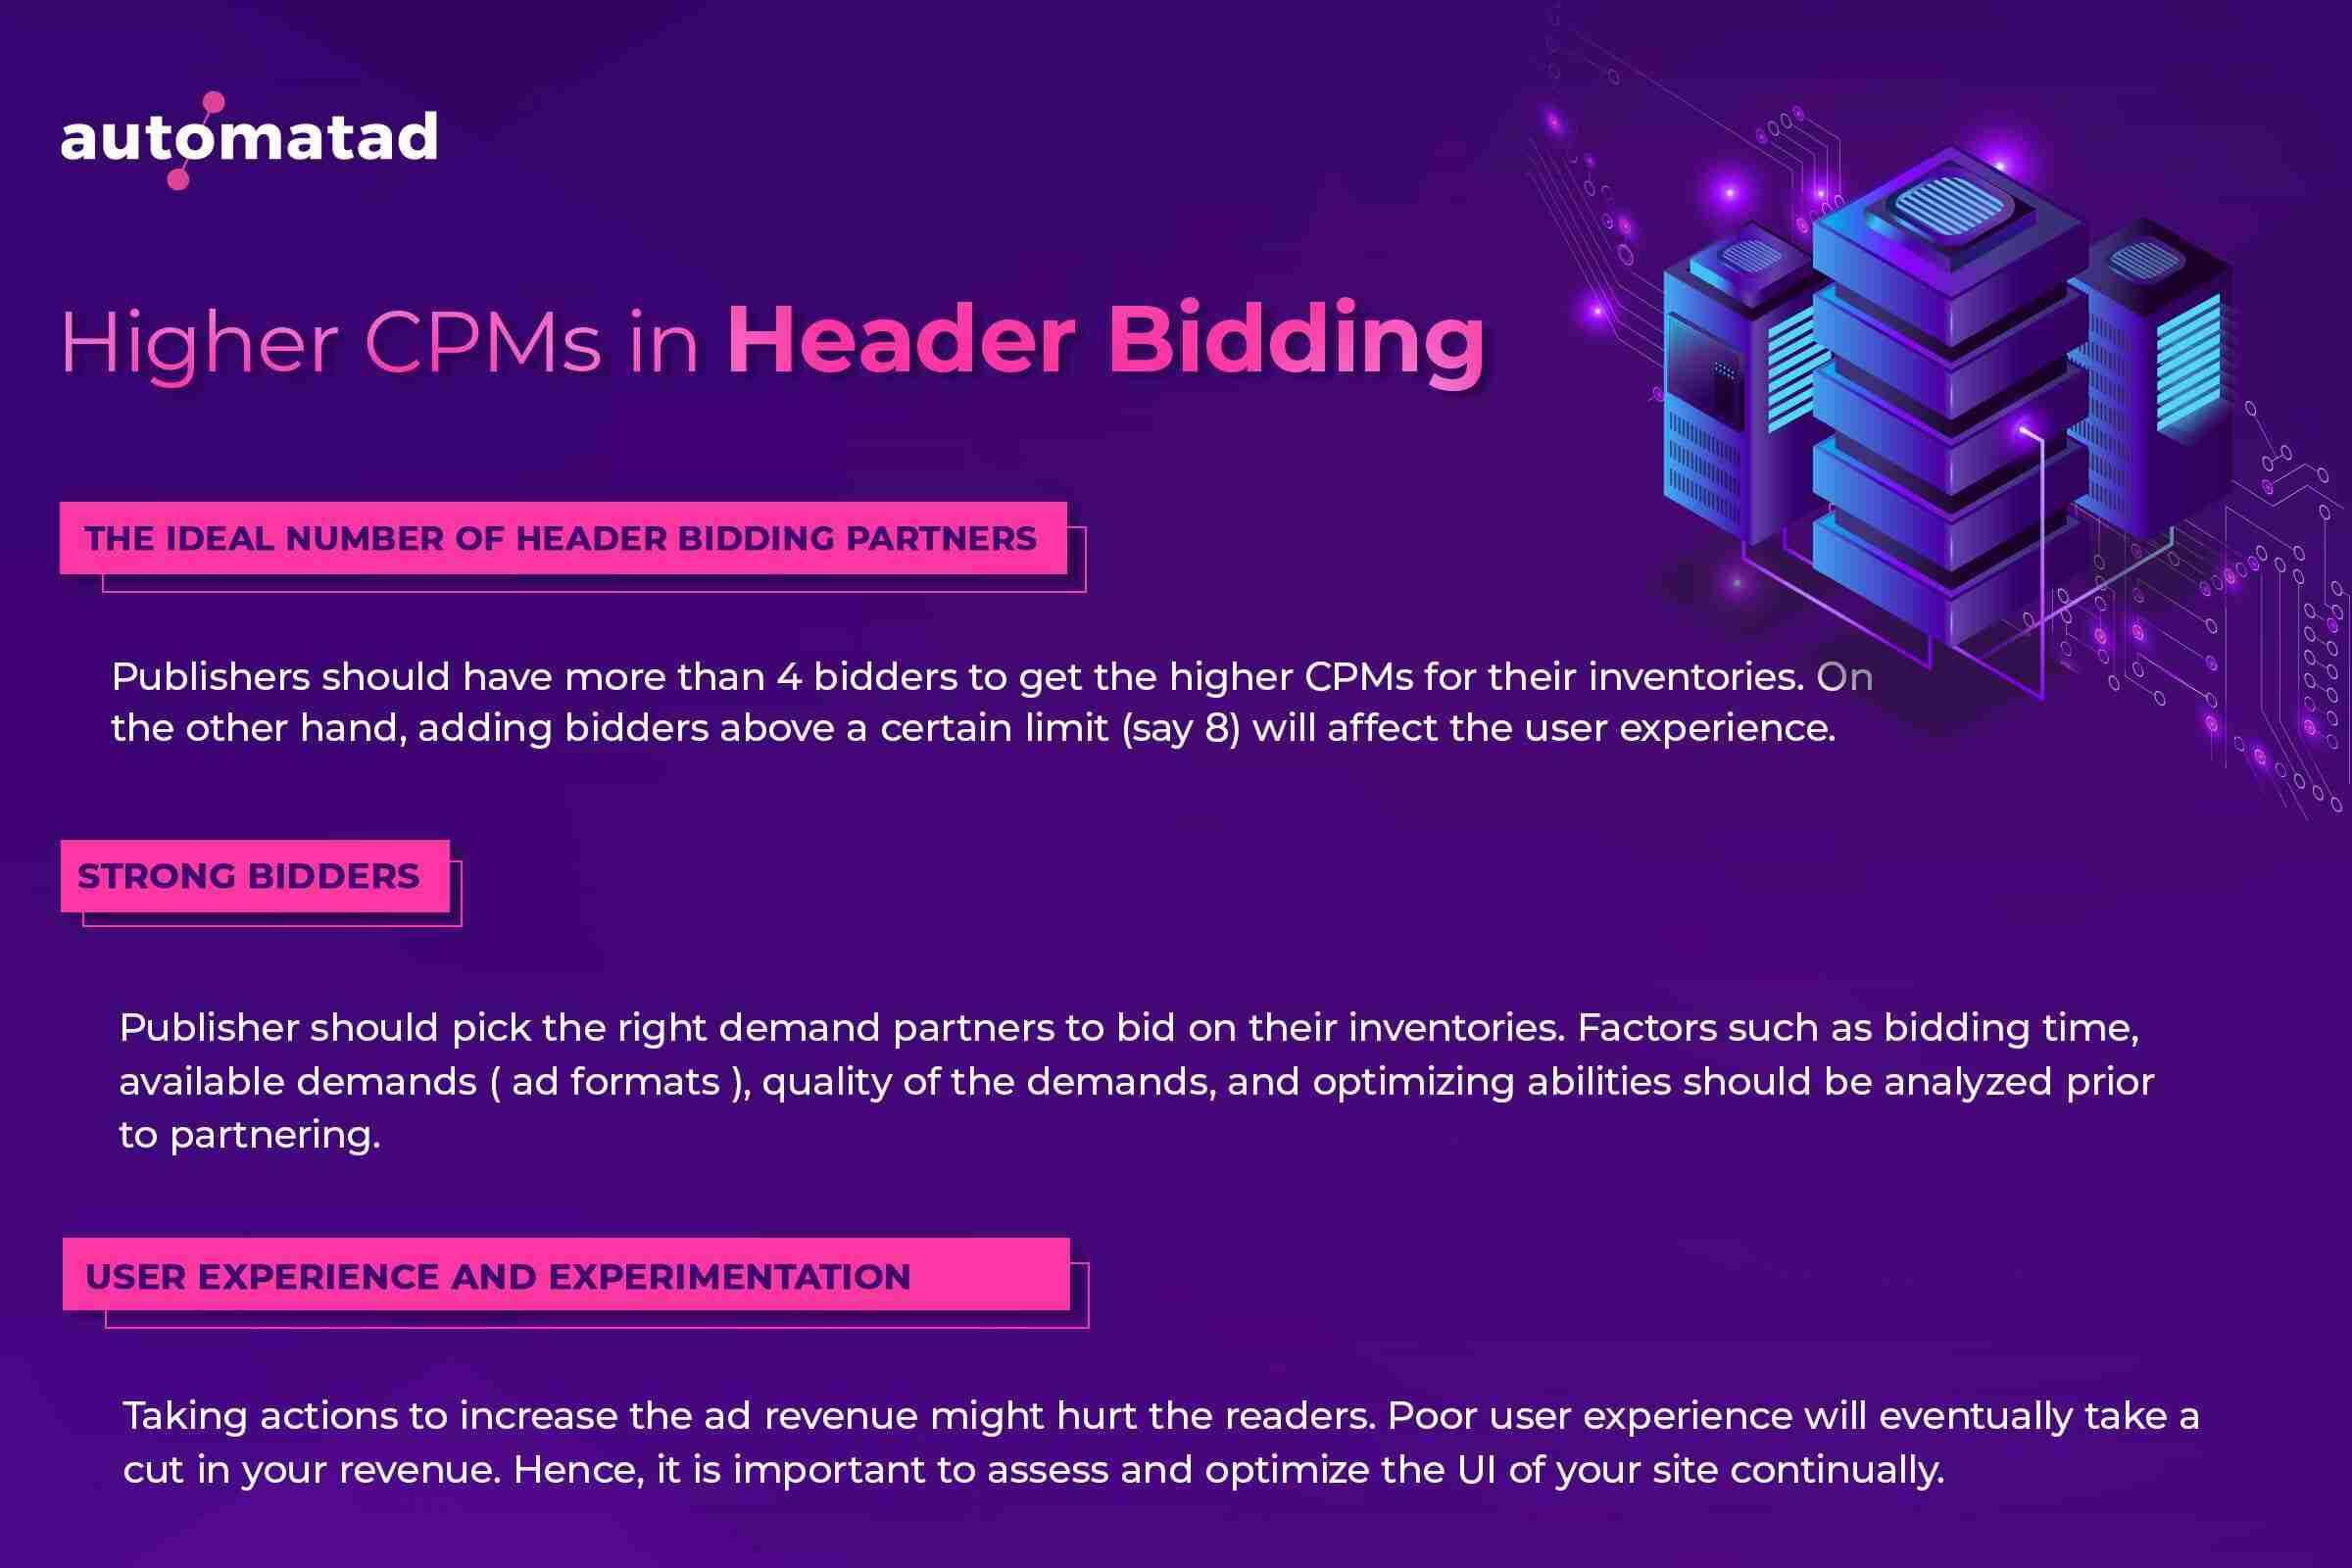 Higher CPMs in Header Bidding